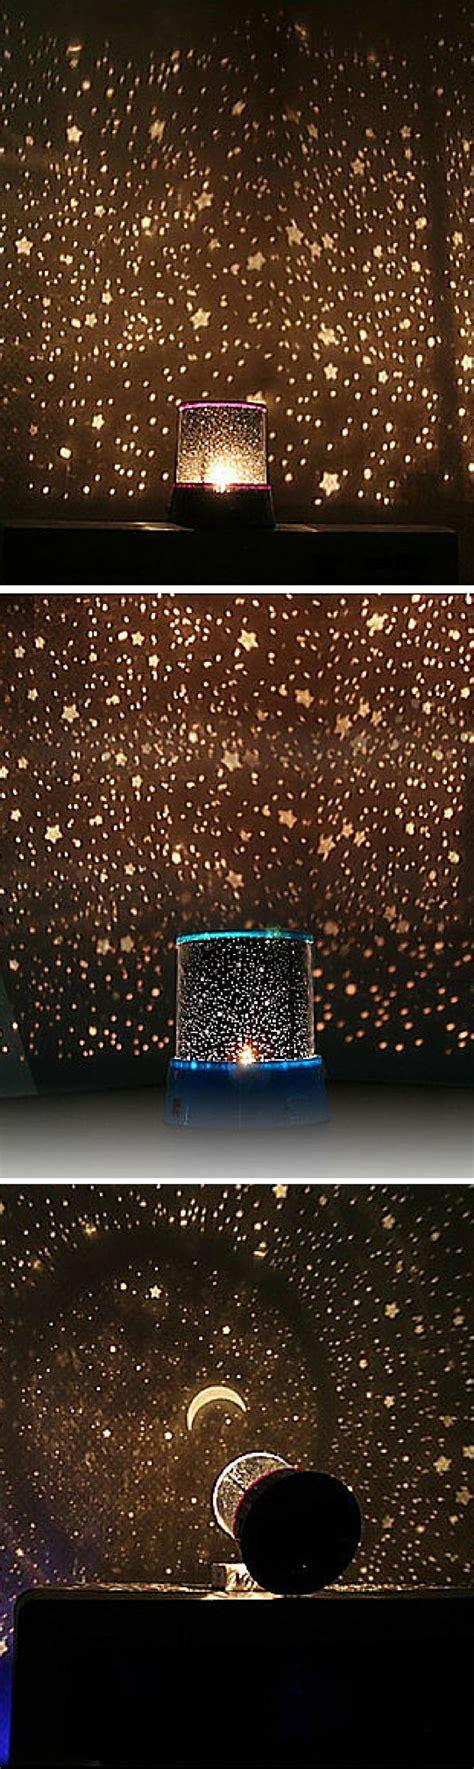 bedroom starry night lights 144 best haunt images on pinterest halloween ideas